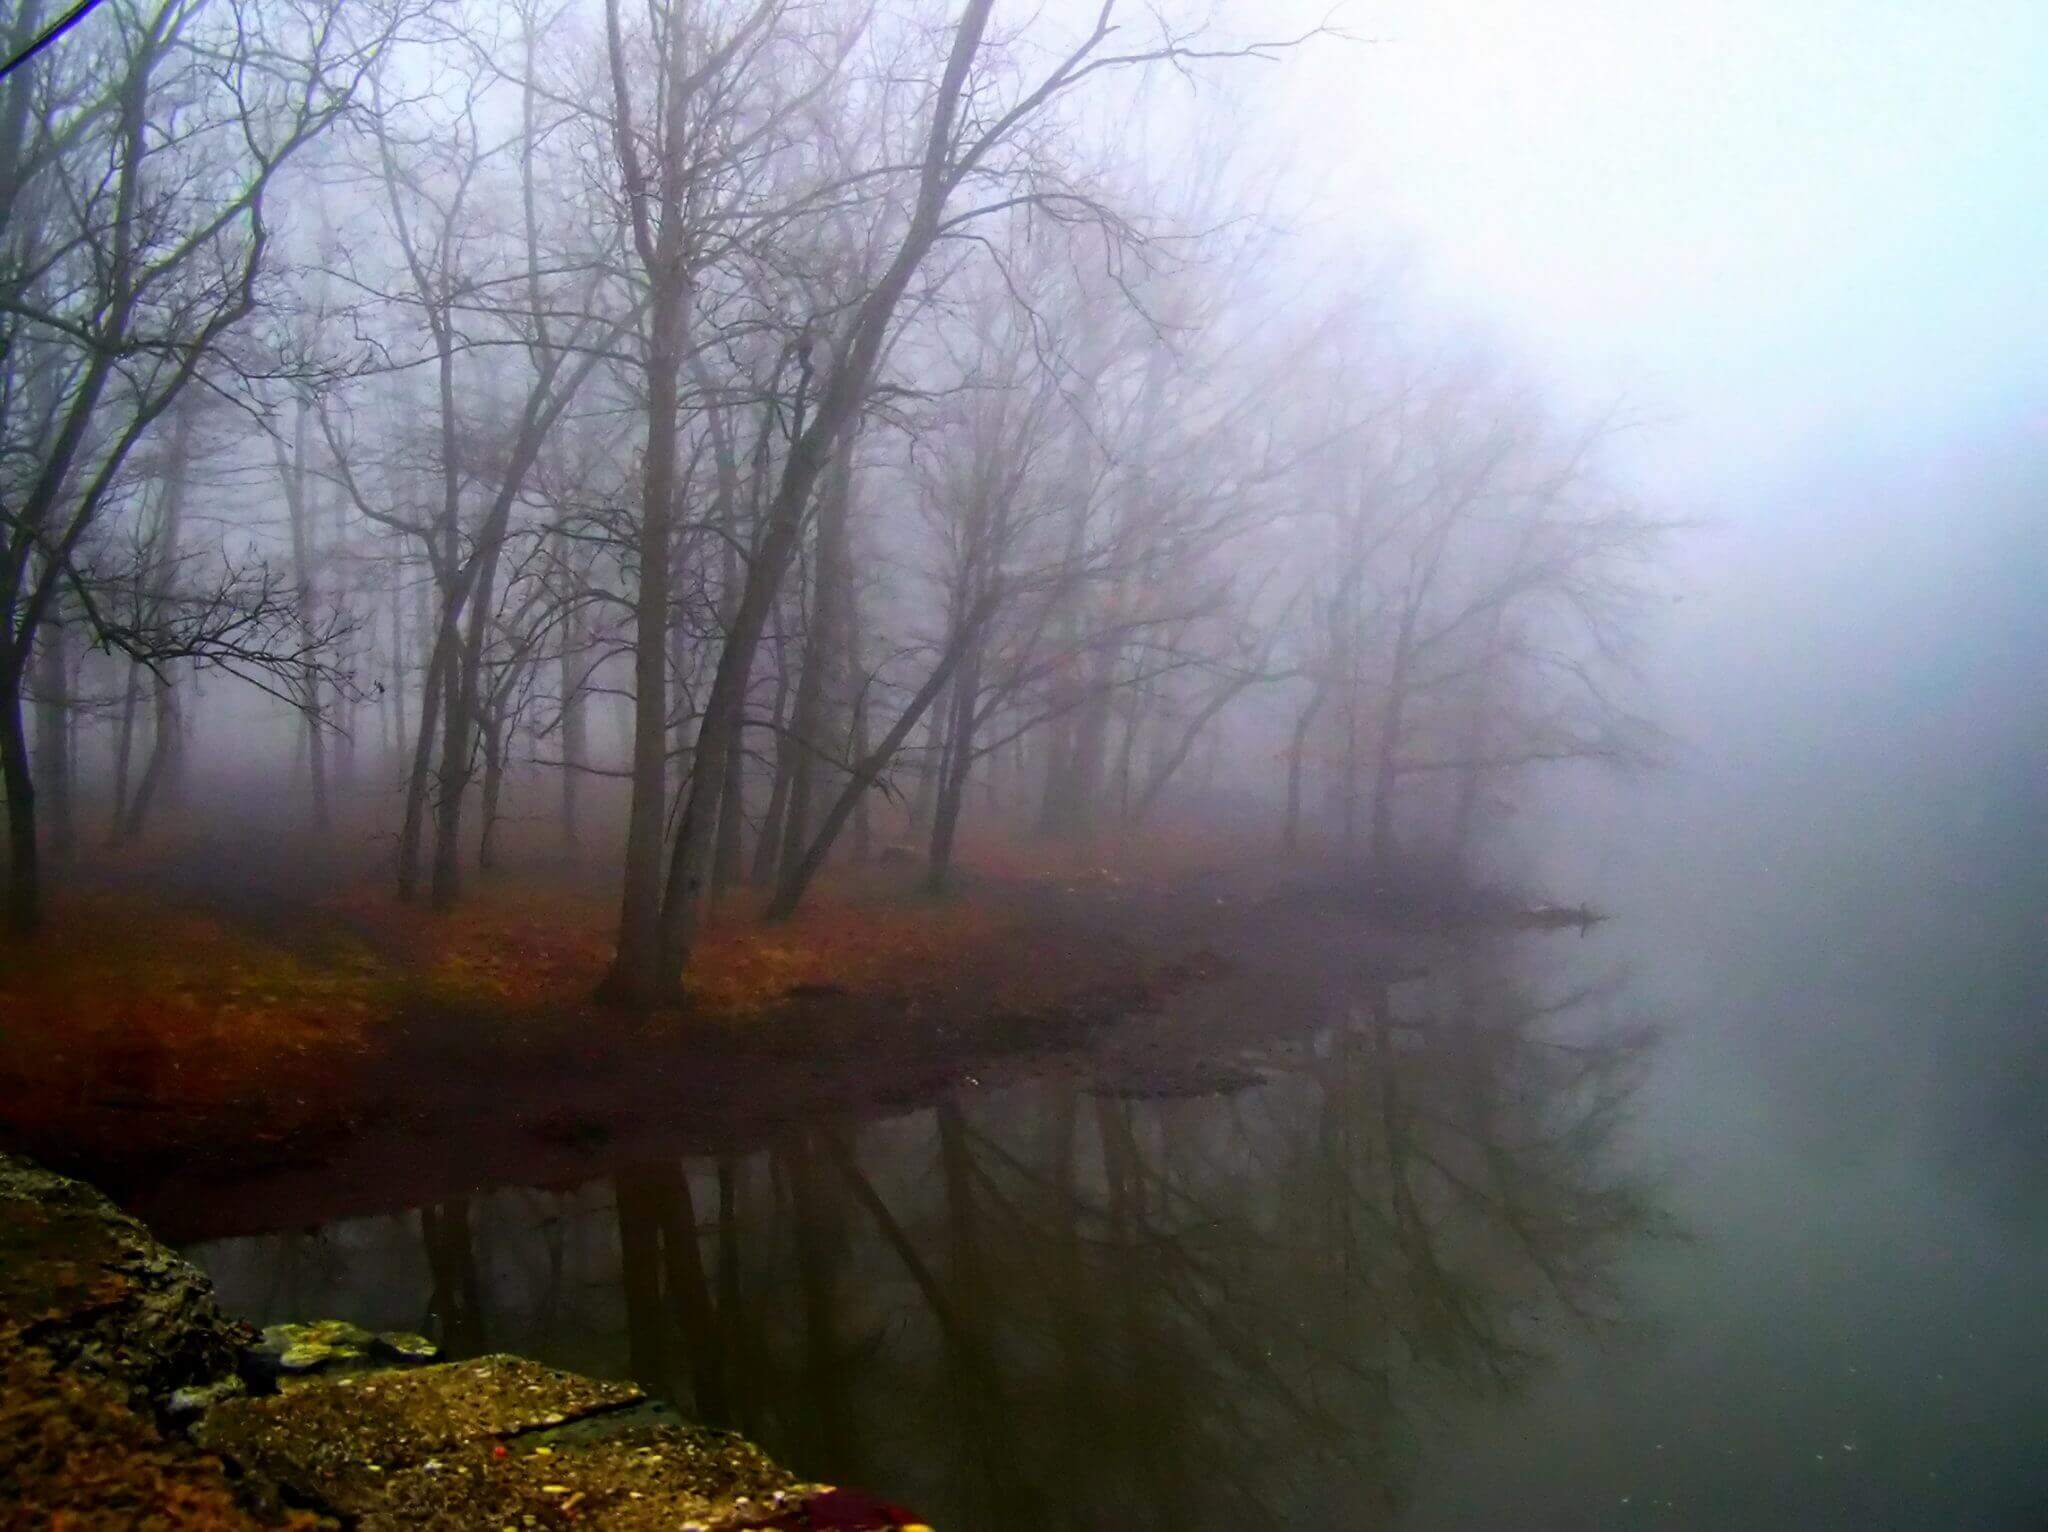 image of foggy landscape